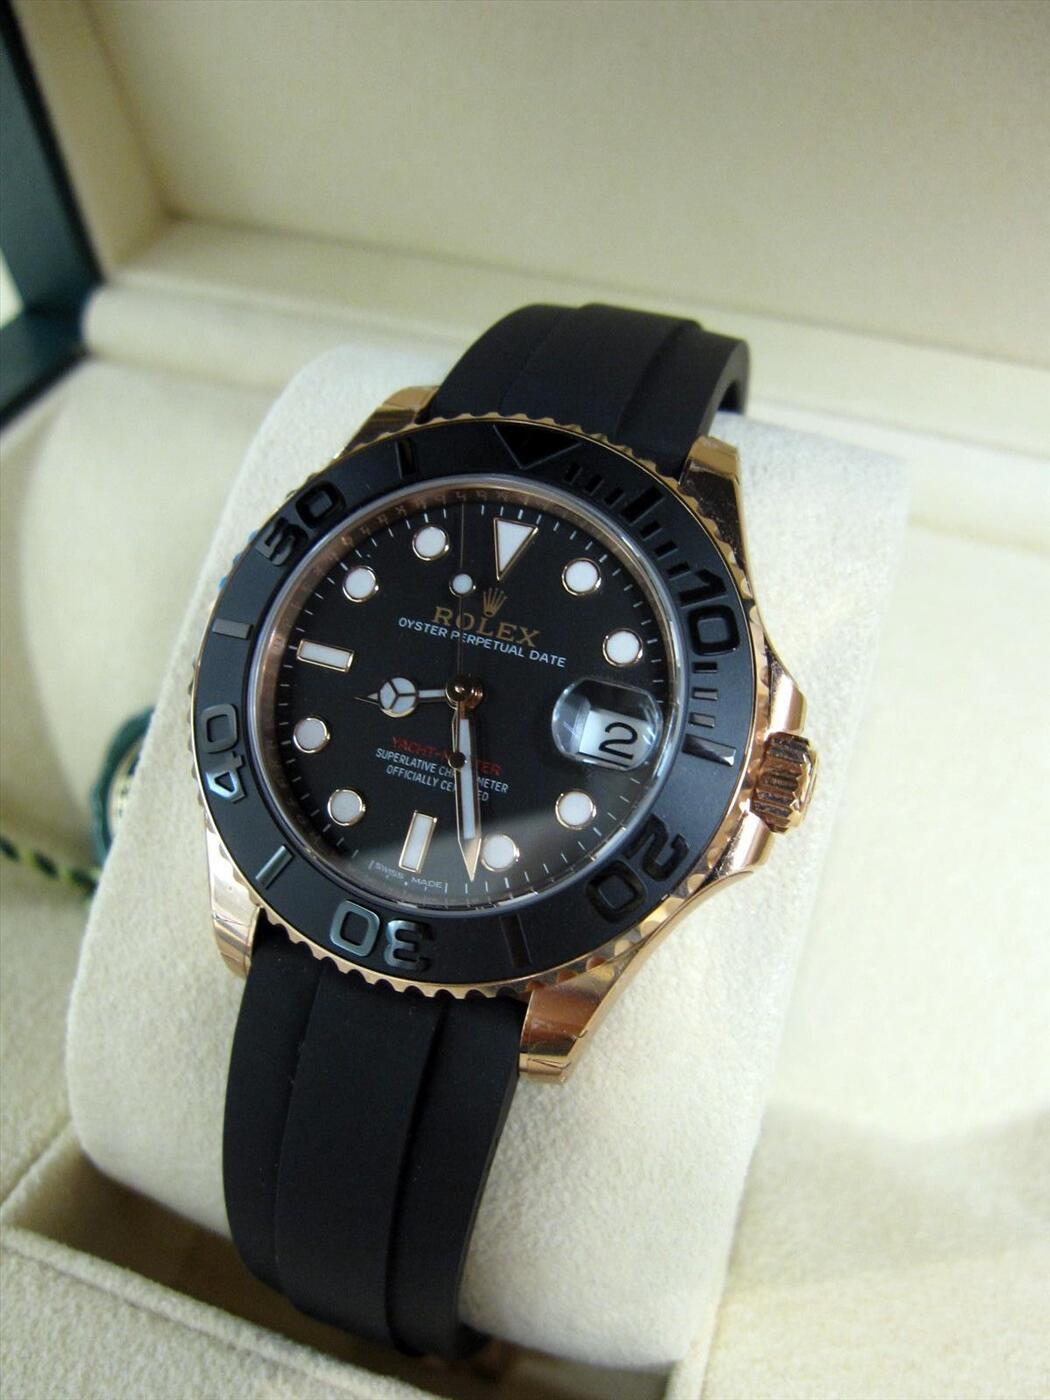 Rolex Yacht-Master 116655 Automatic Black Dial 18kt Everose Gold Black Rubber Strap Unisex Watch